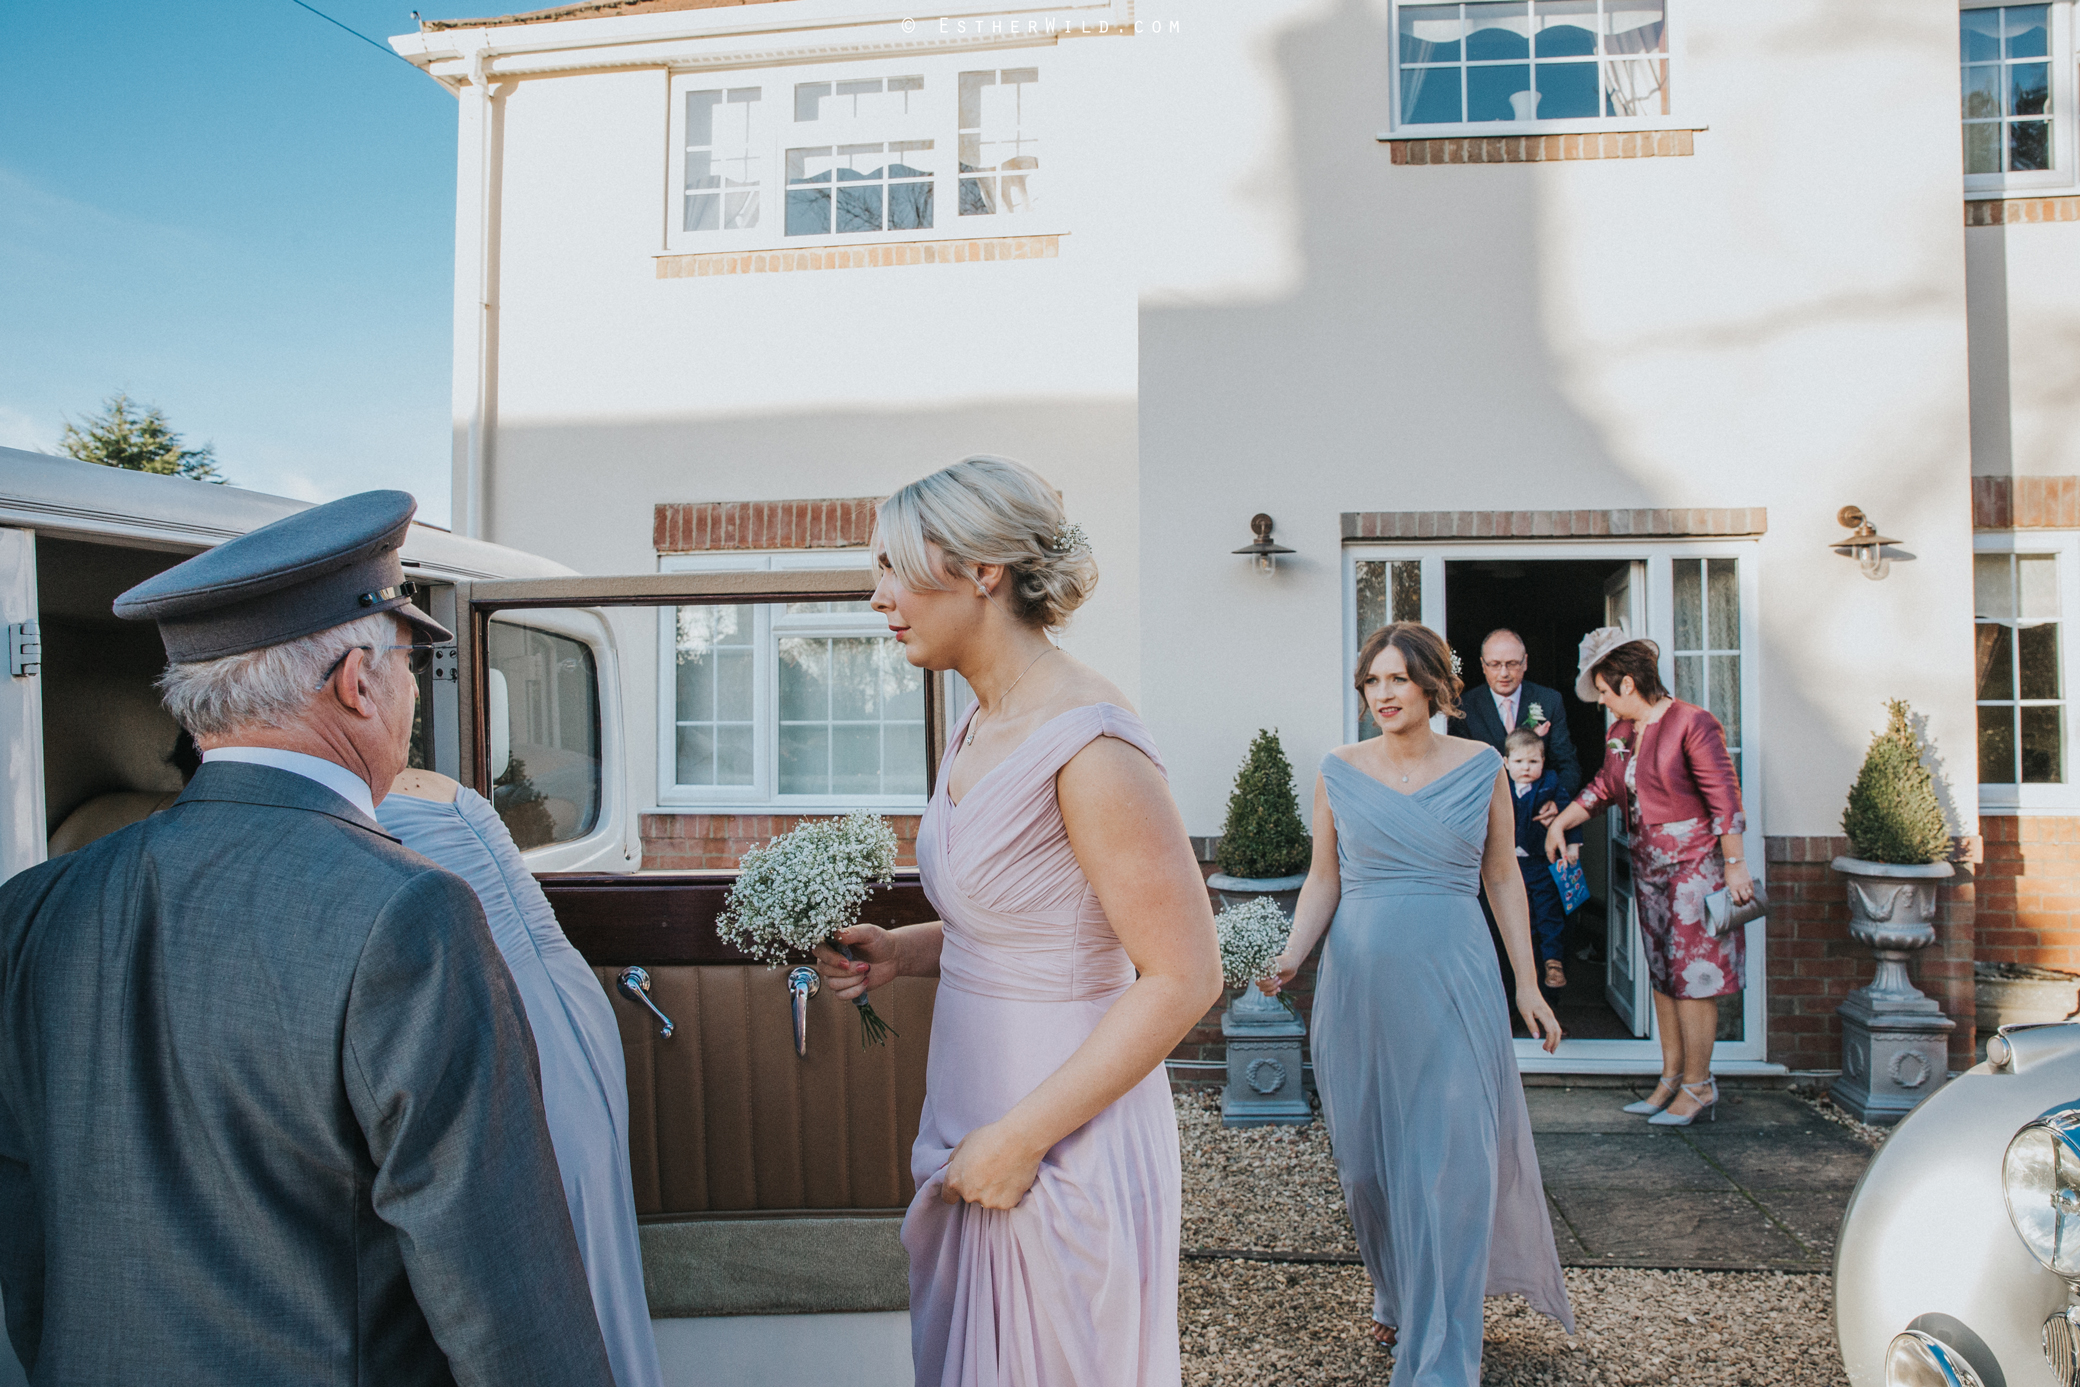 Wedding_Kings_Lynn_Town_Hall_Norfolk_Photographer_Esther_Wild_IMG_0740.jpg